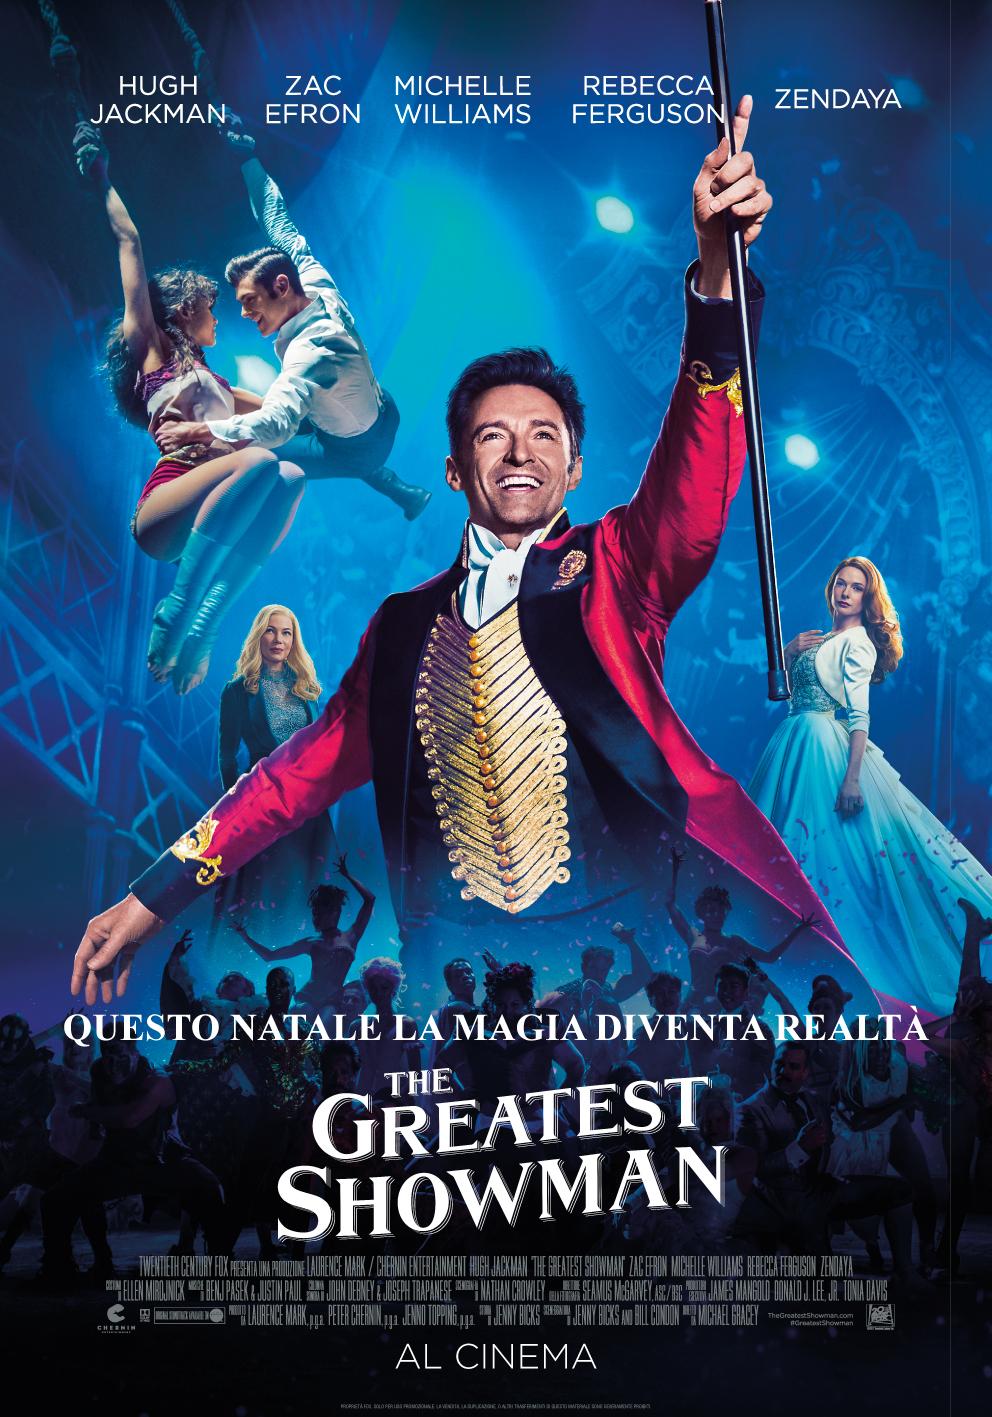 The Greatest Showman 2017 Photo Gallery Imdb